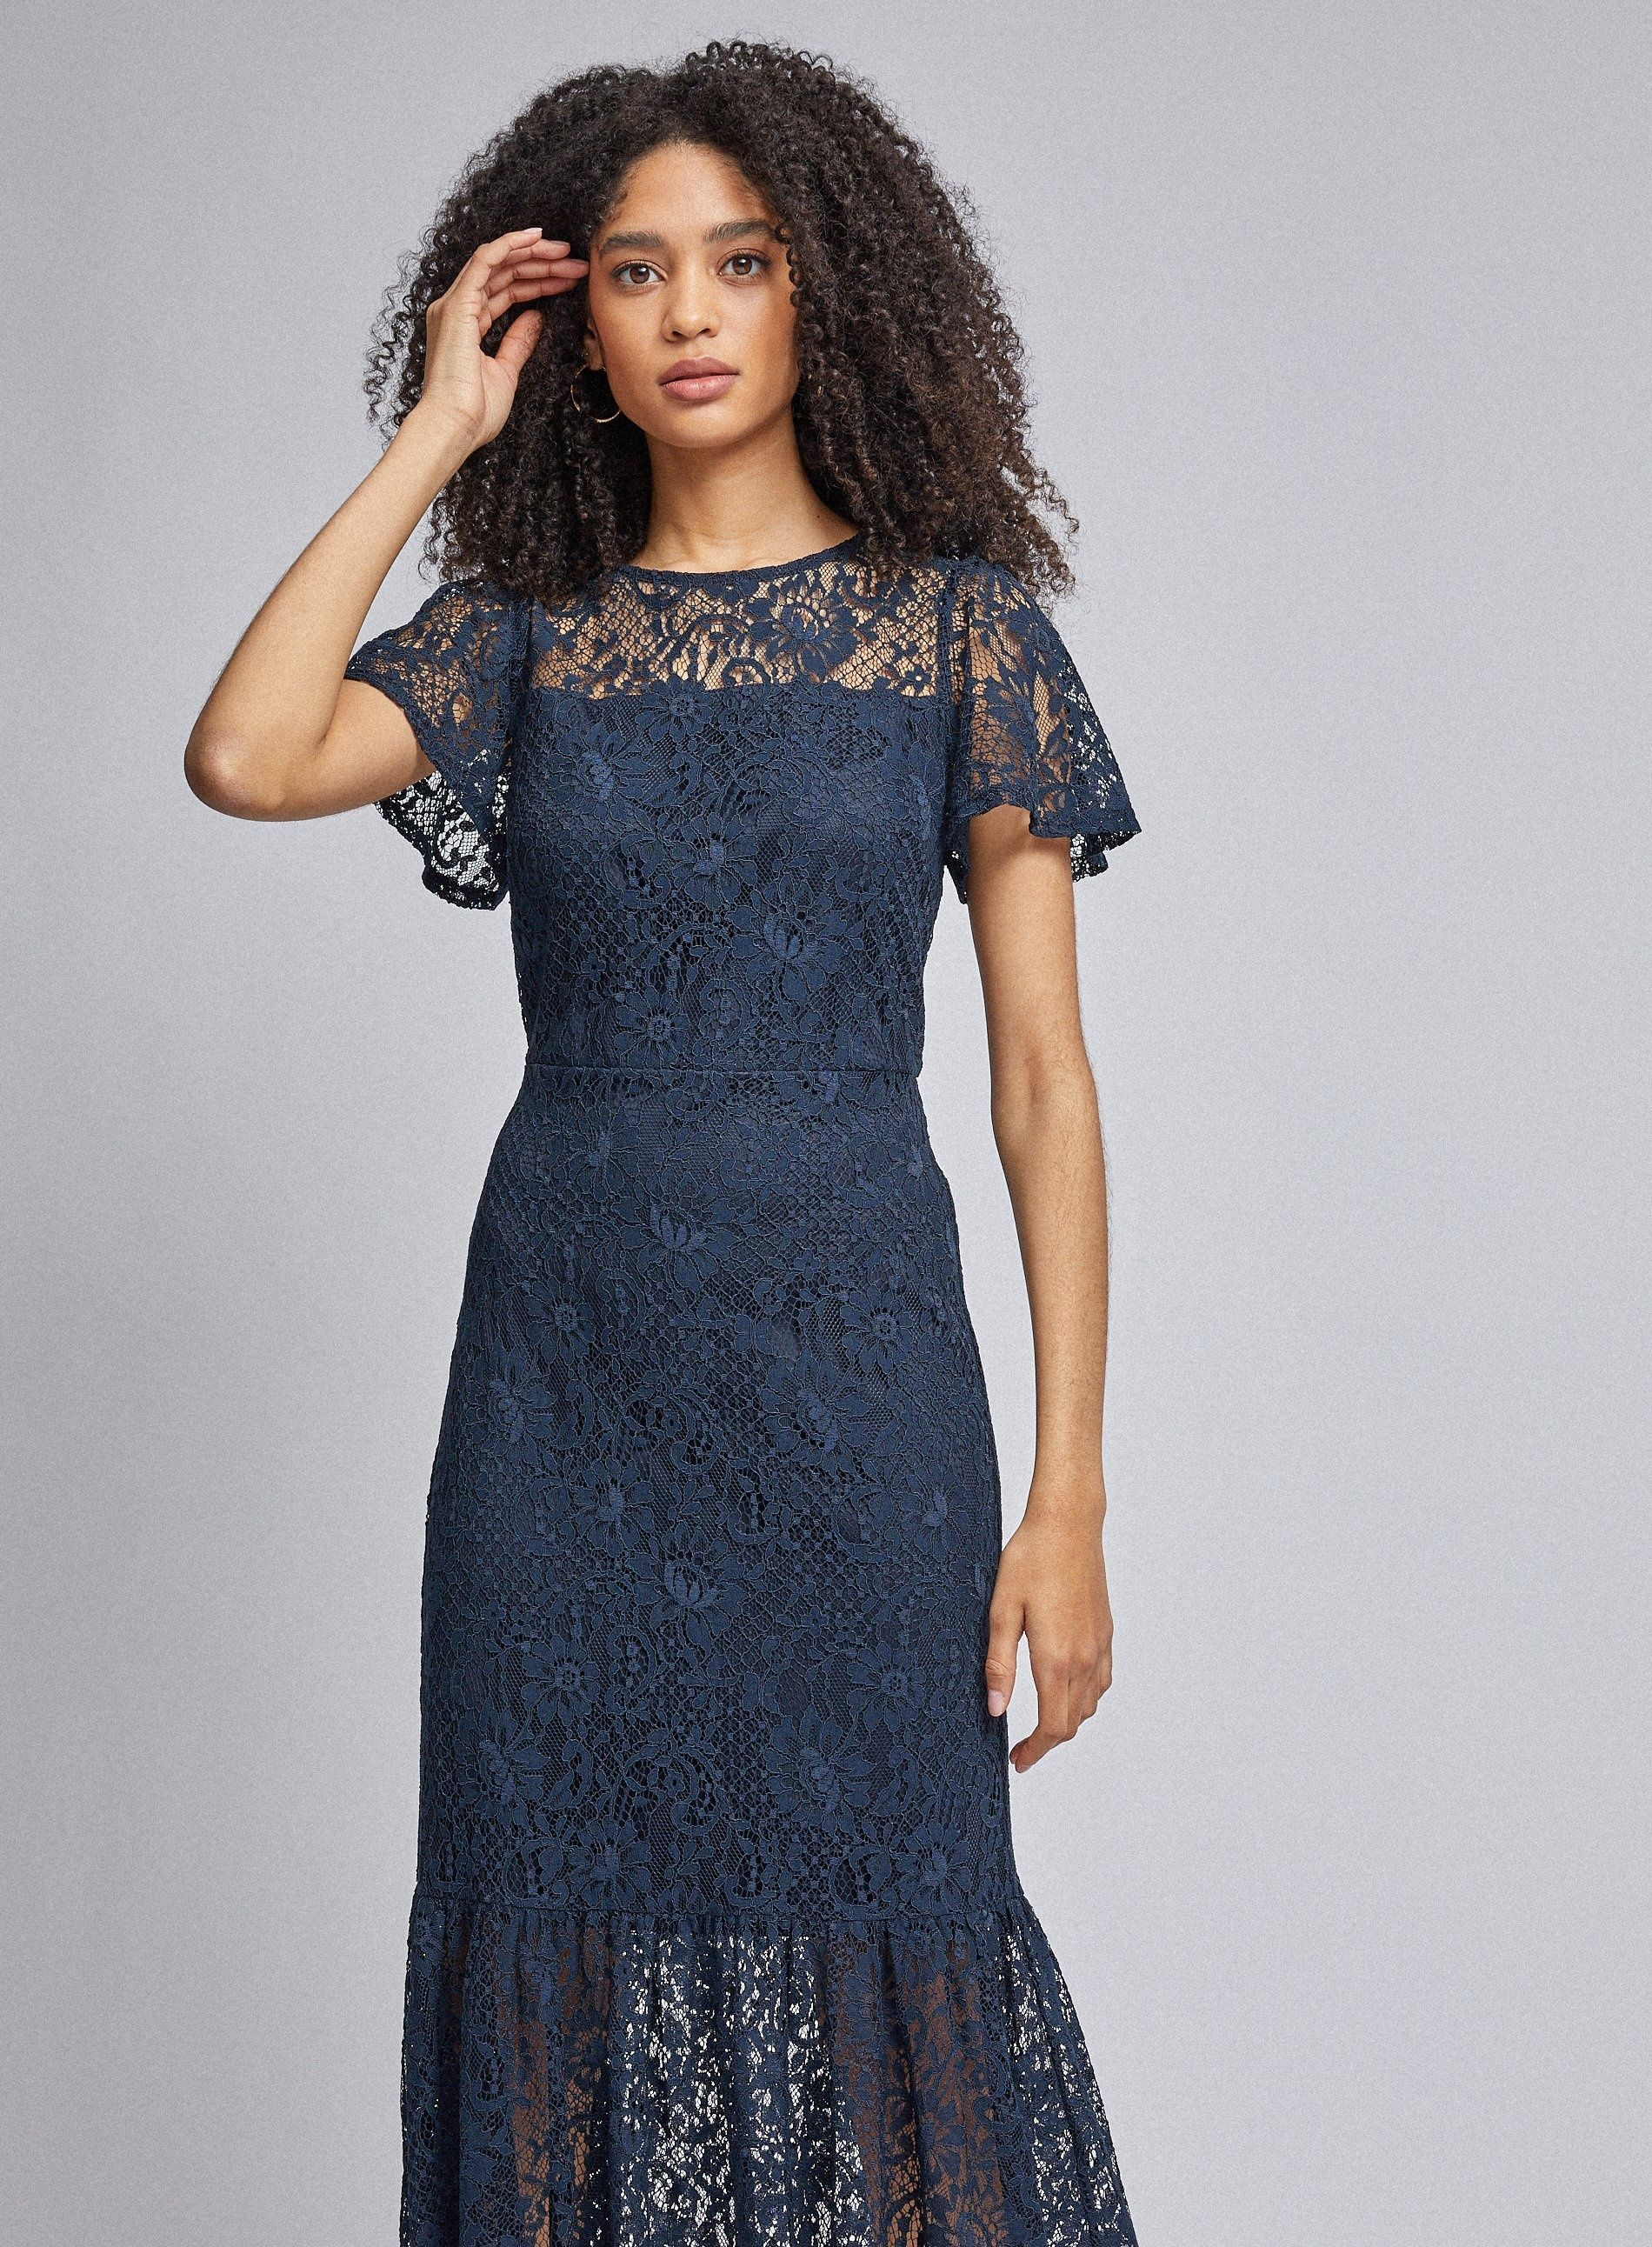 Dorothy Perkins Womens Blue Lace Peplum Midi Dress Round Neck Short Sleeve